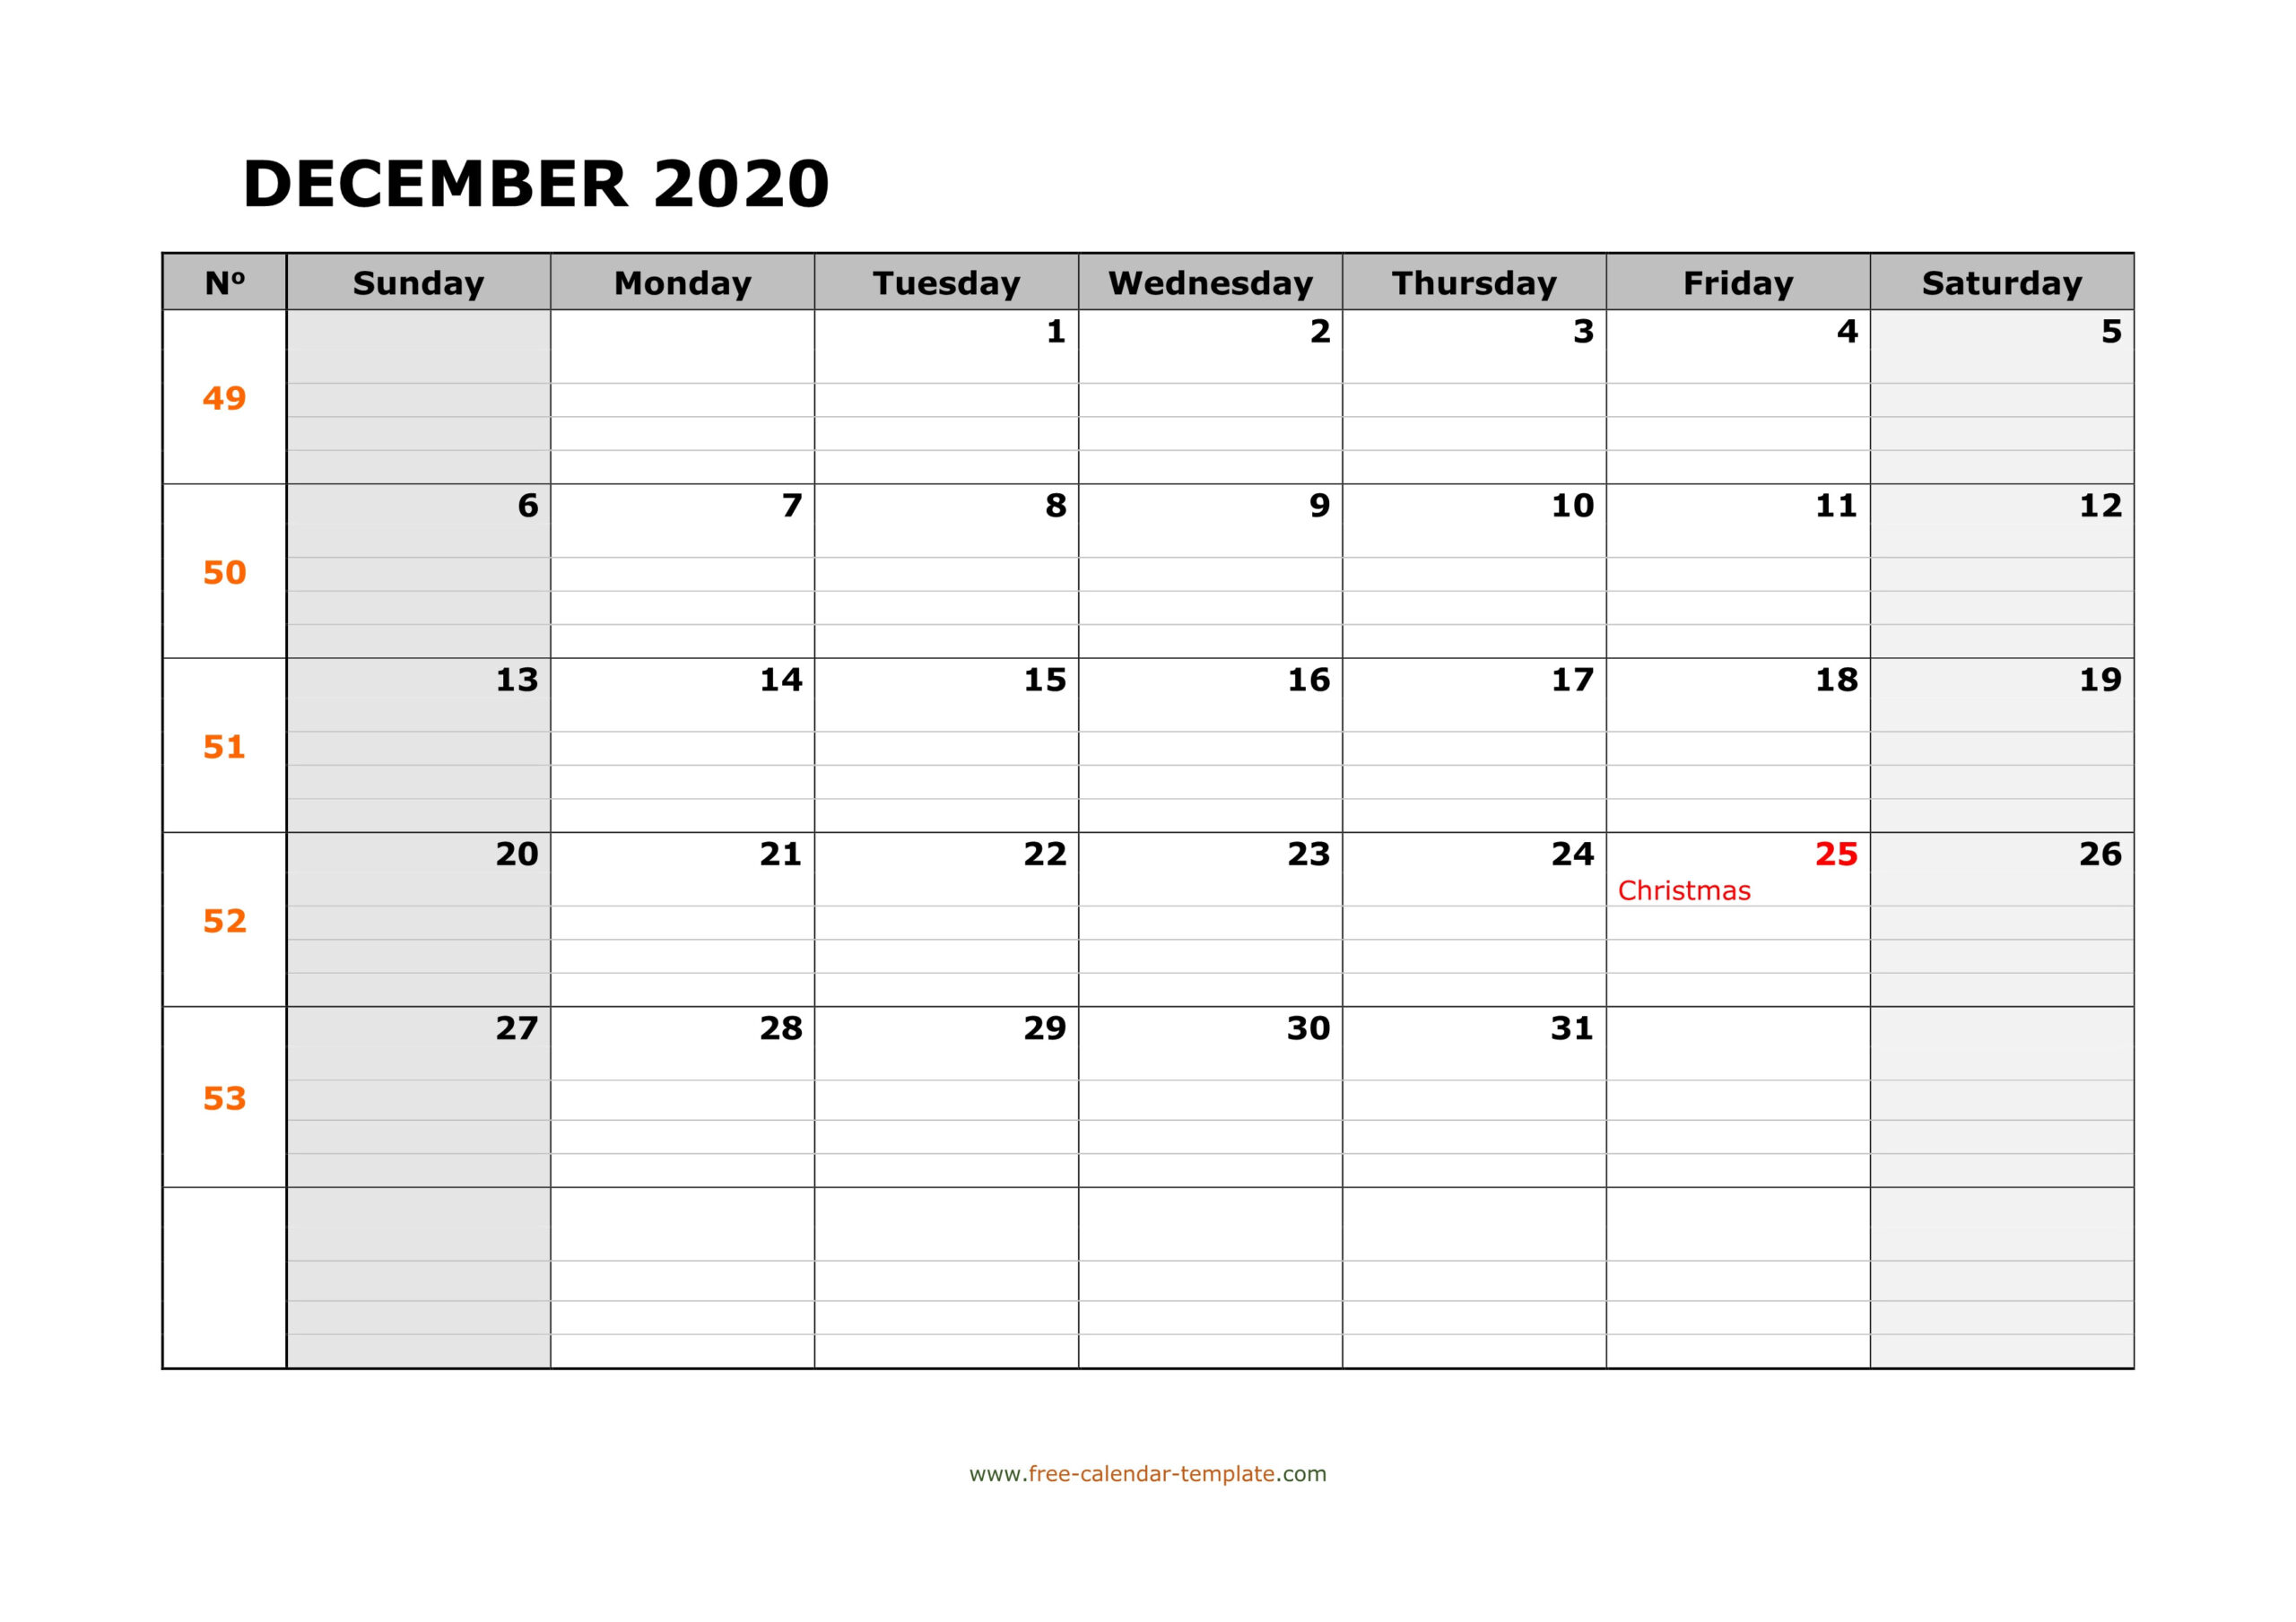 December 2020 Free Calendar Tempplate | Free-Calendar  Printable Word Calendar With Lines